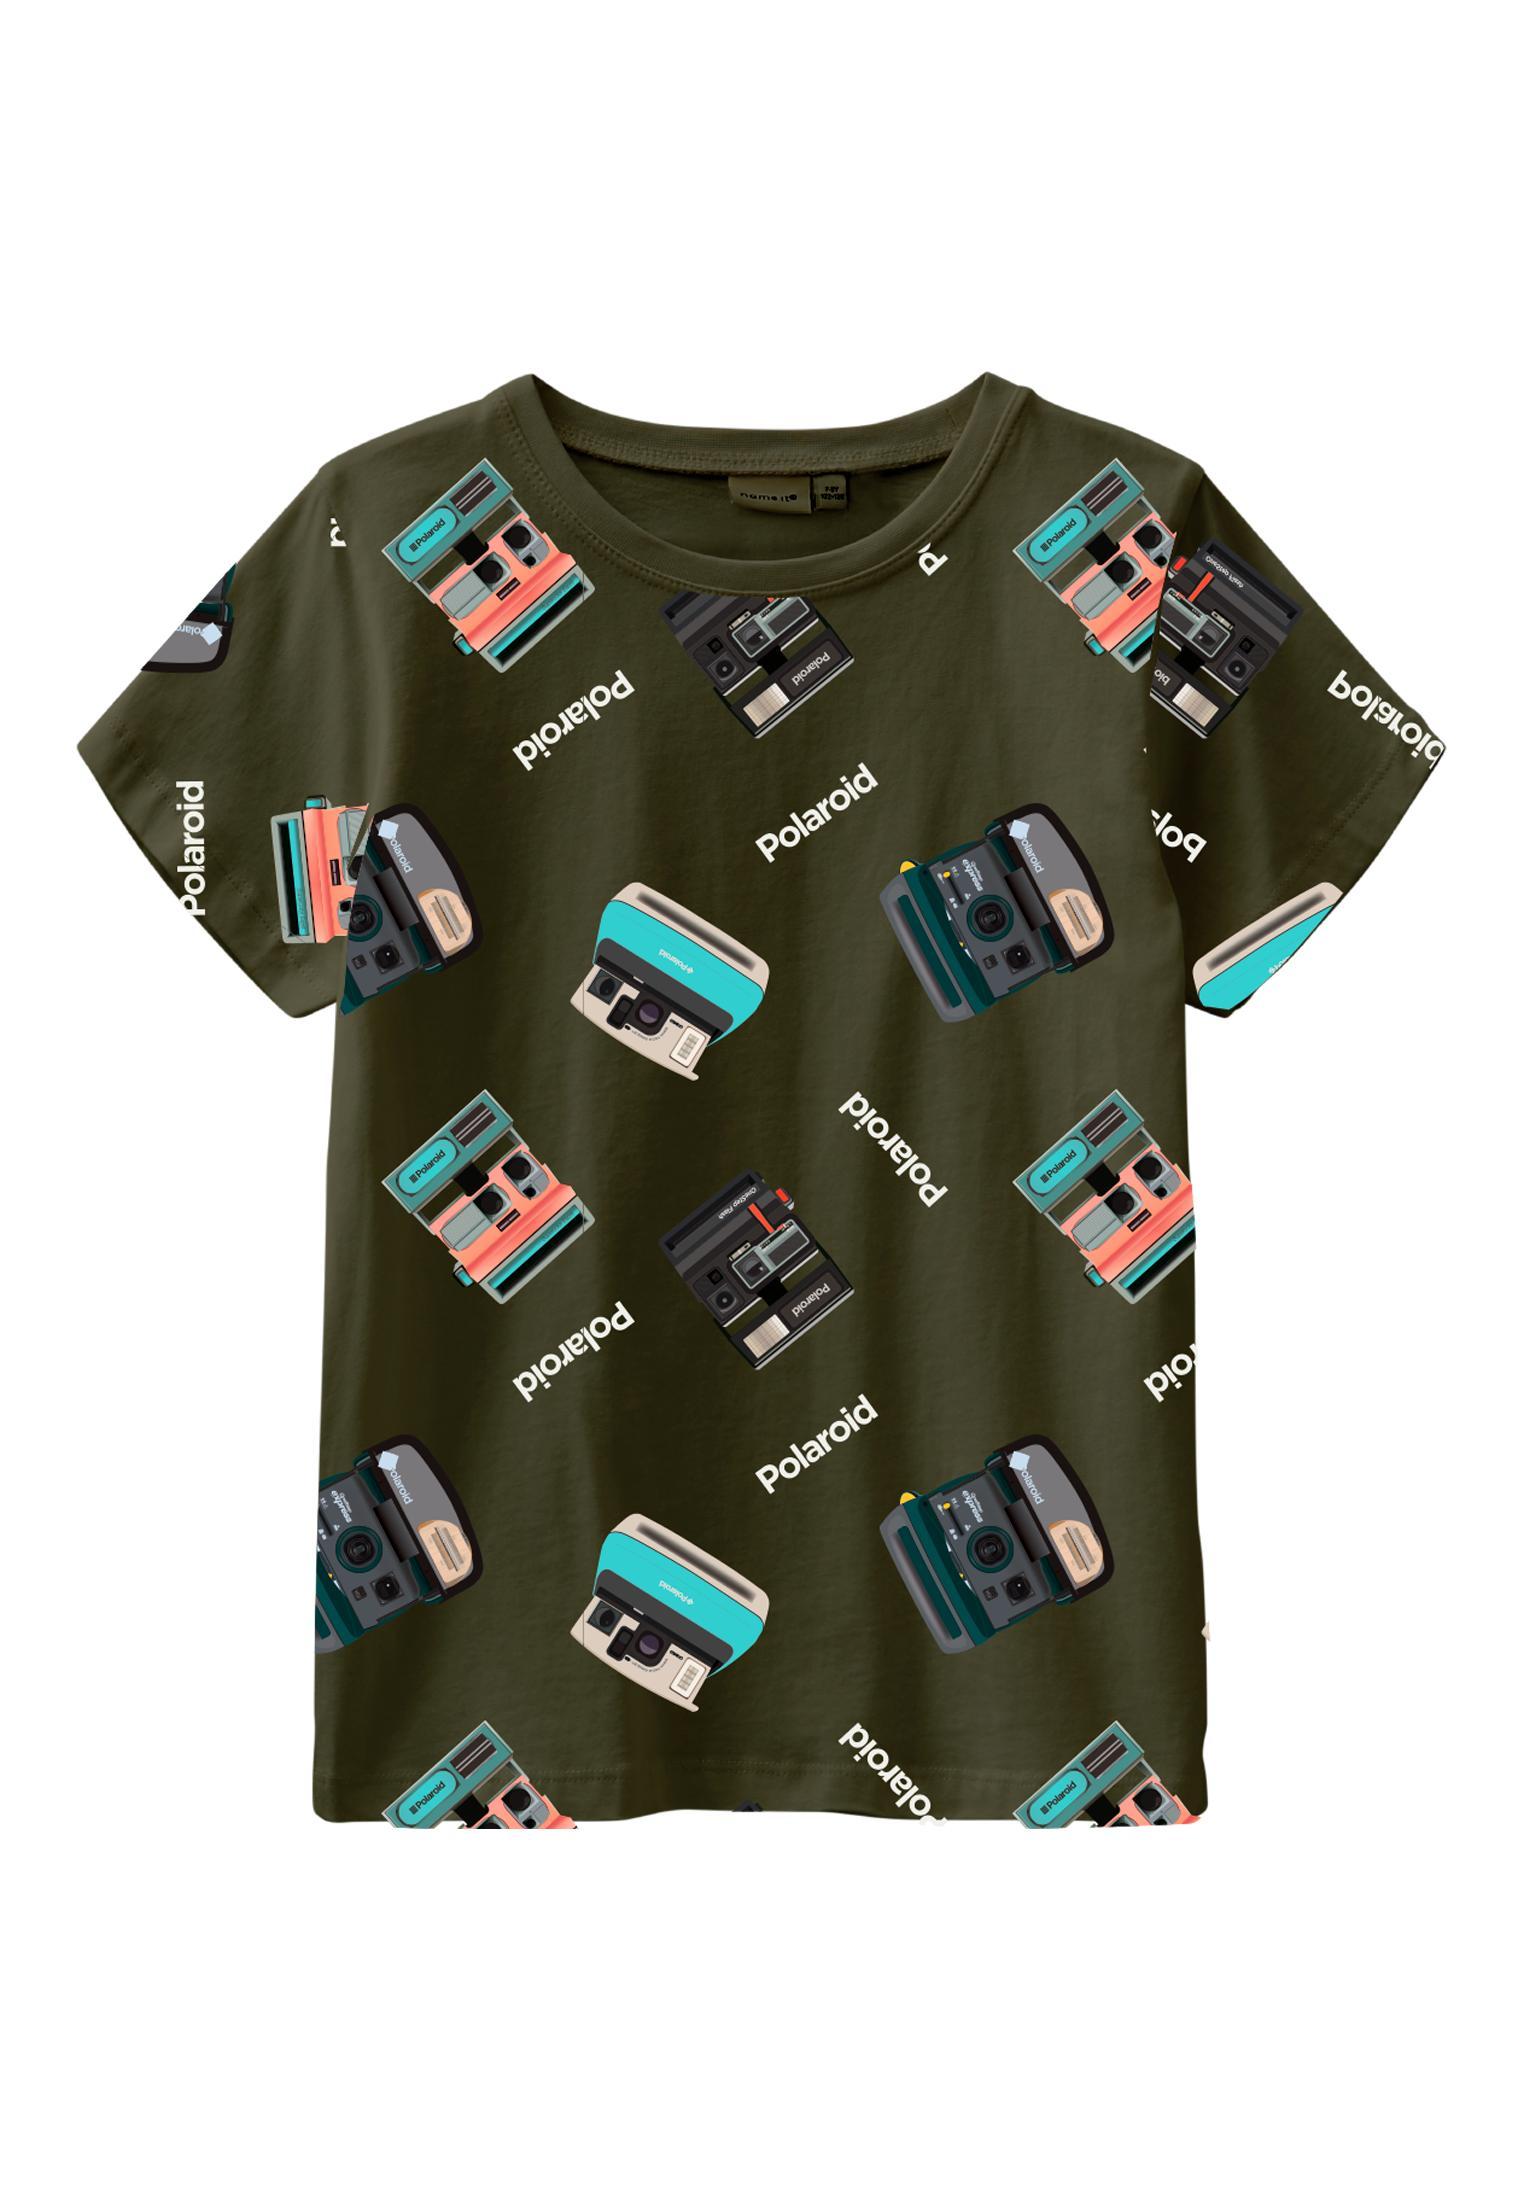 Name It Polaroid SS t-shirt, ivy green, 122-128